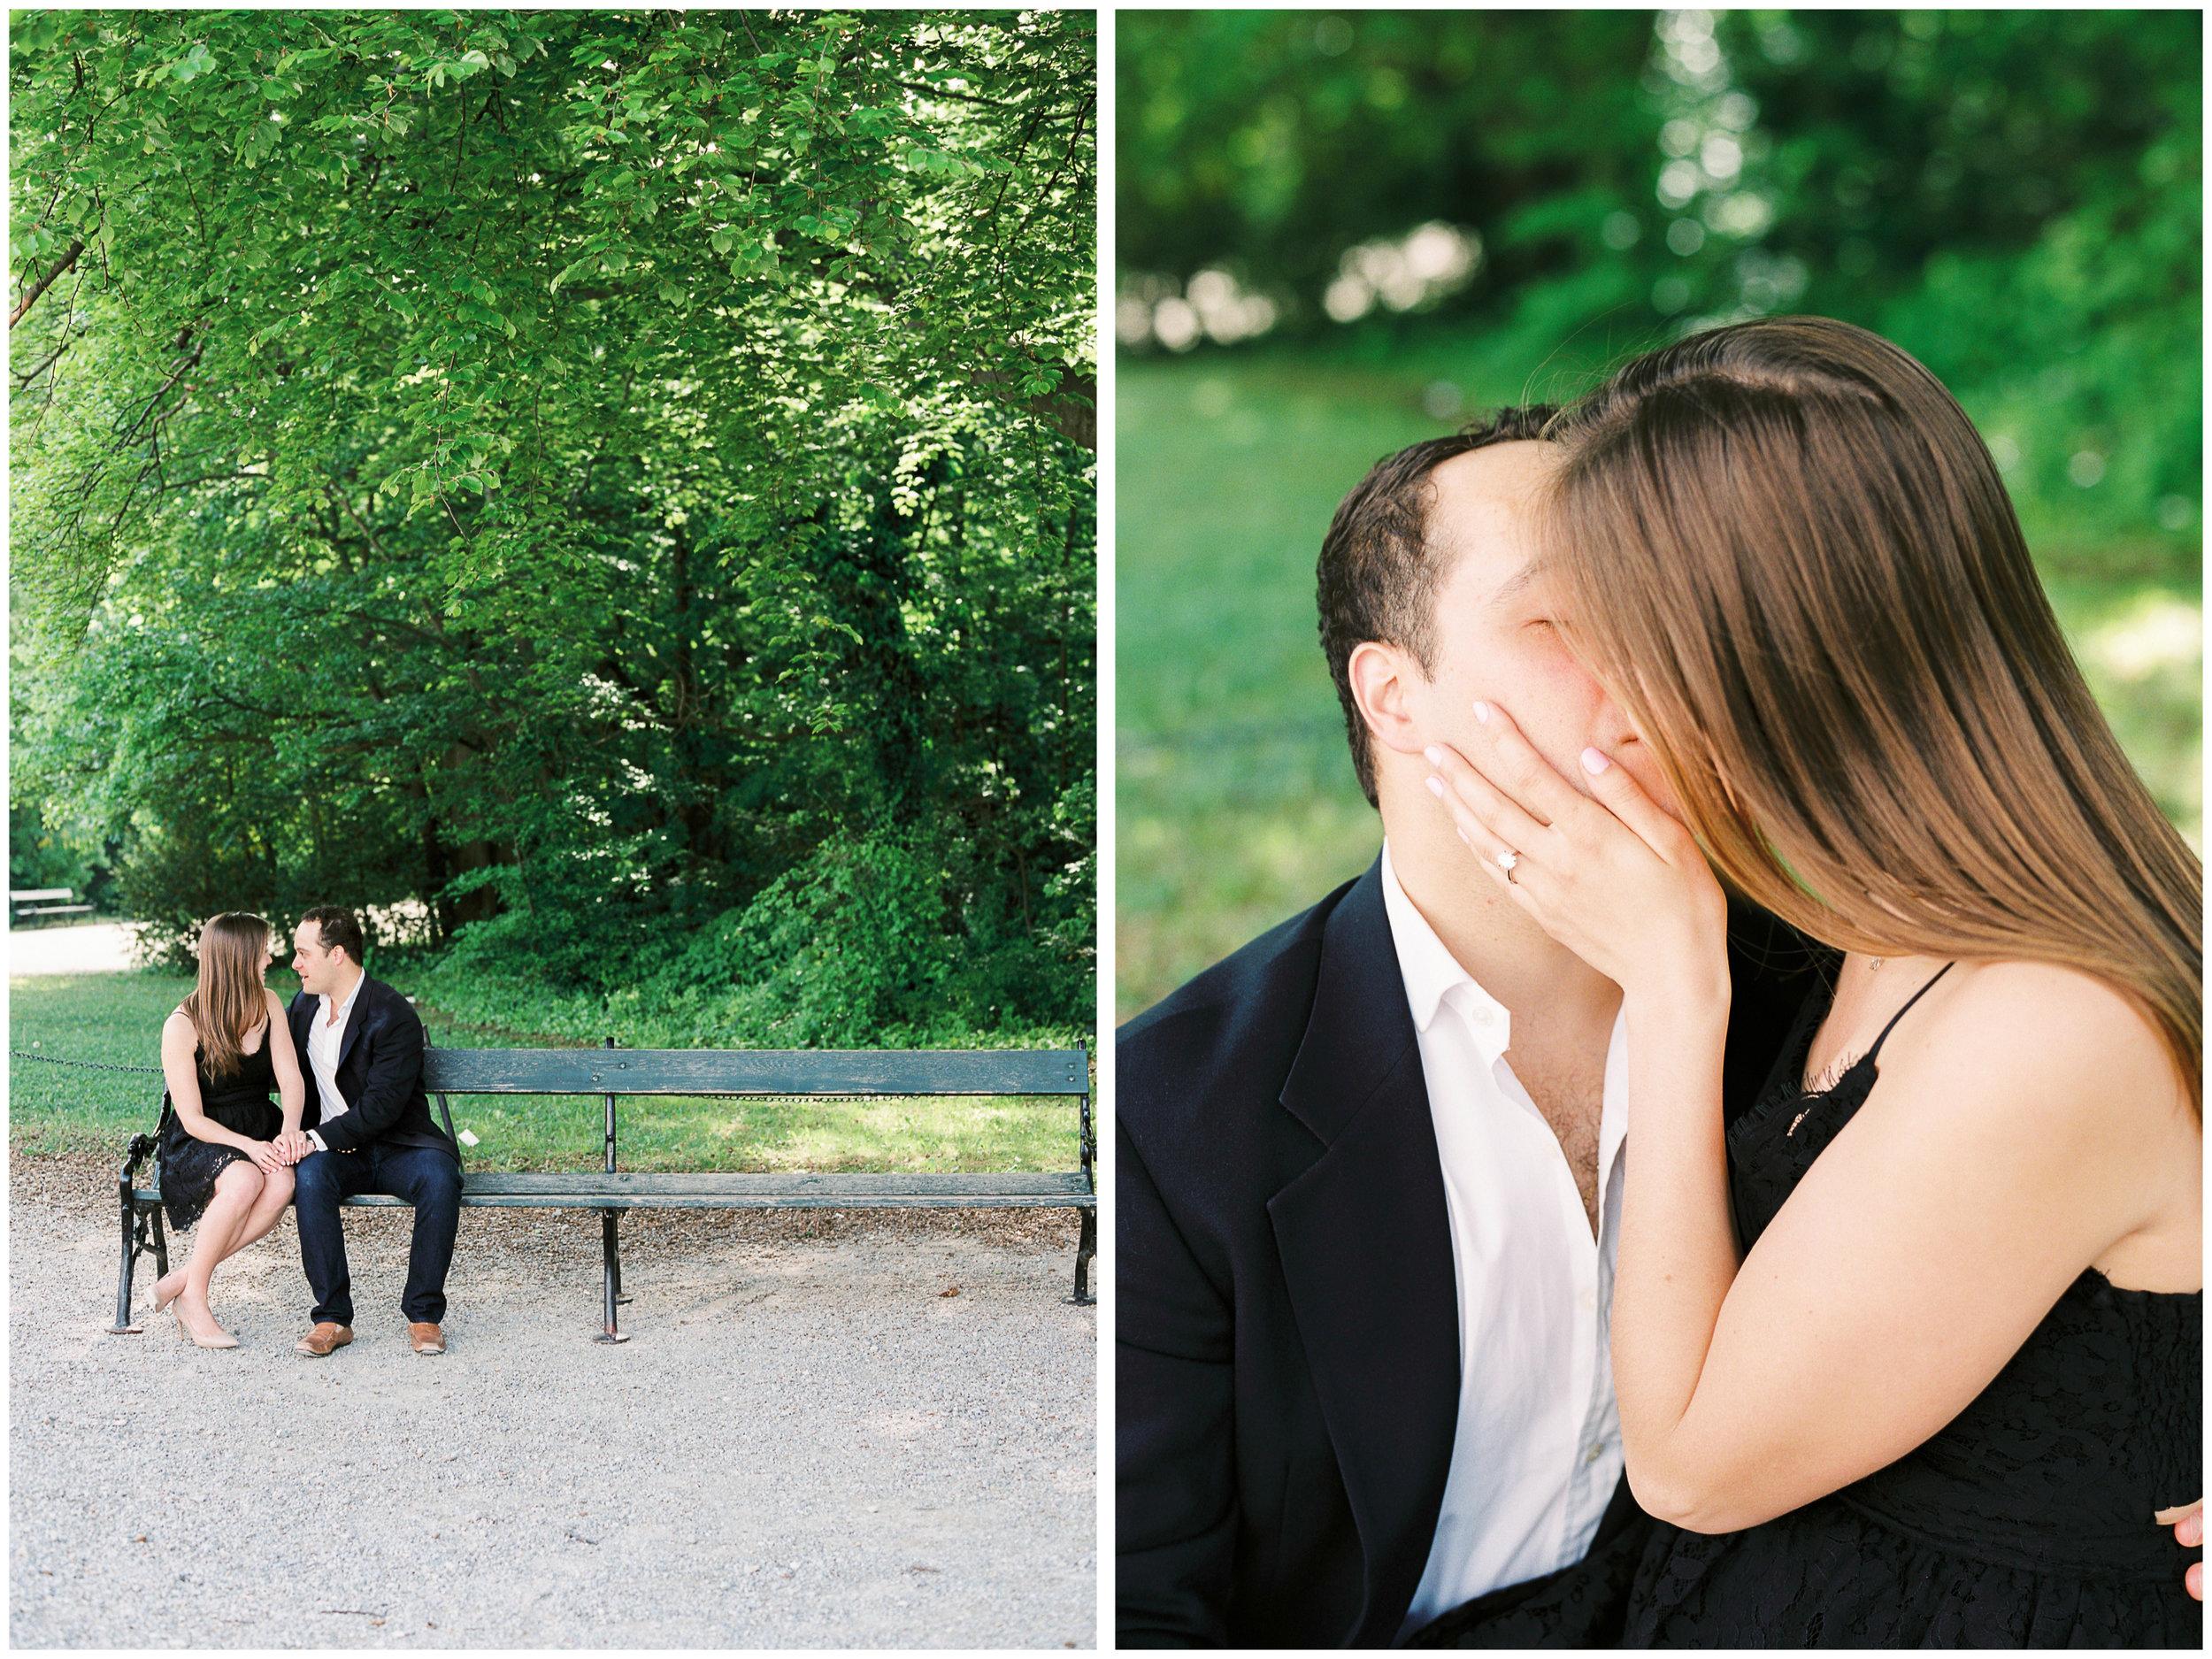 Secret Proposal | The Gloriette, Vienna | Michelle Mock Photography | Vienna Photographer | Contax 645 | Fuji400H